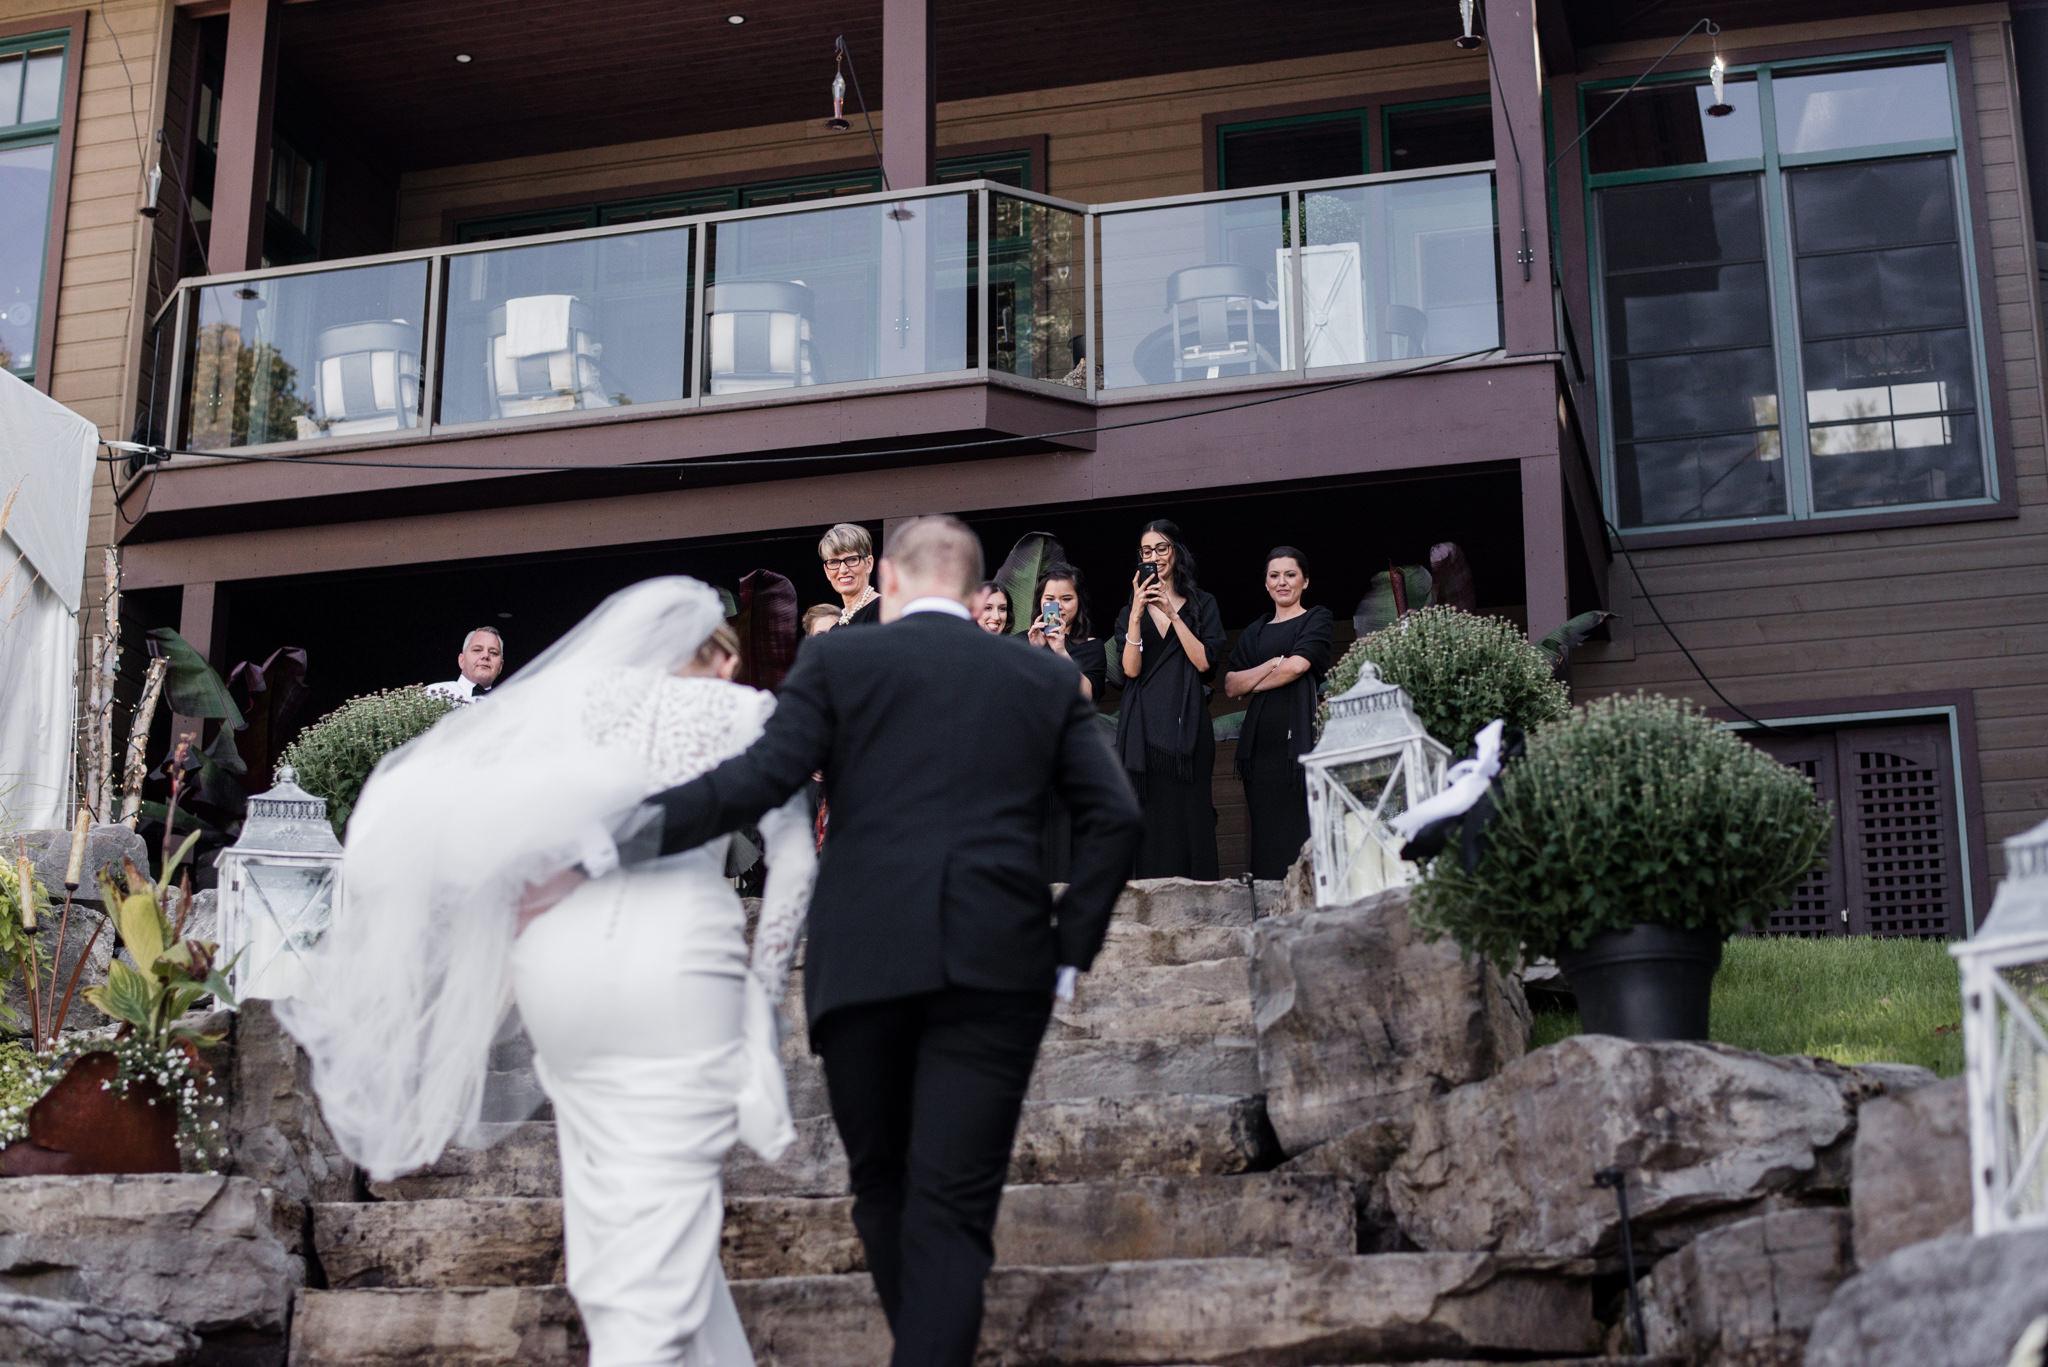 057-wedding-photos-in-forest-ontario-cottage-toronto.jpg